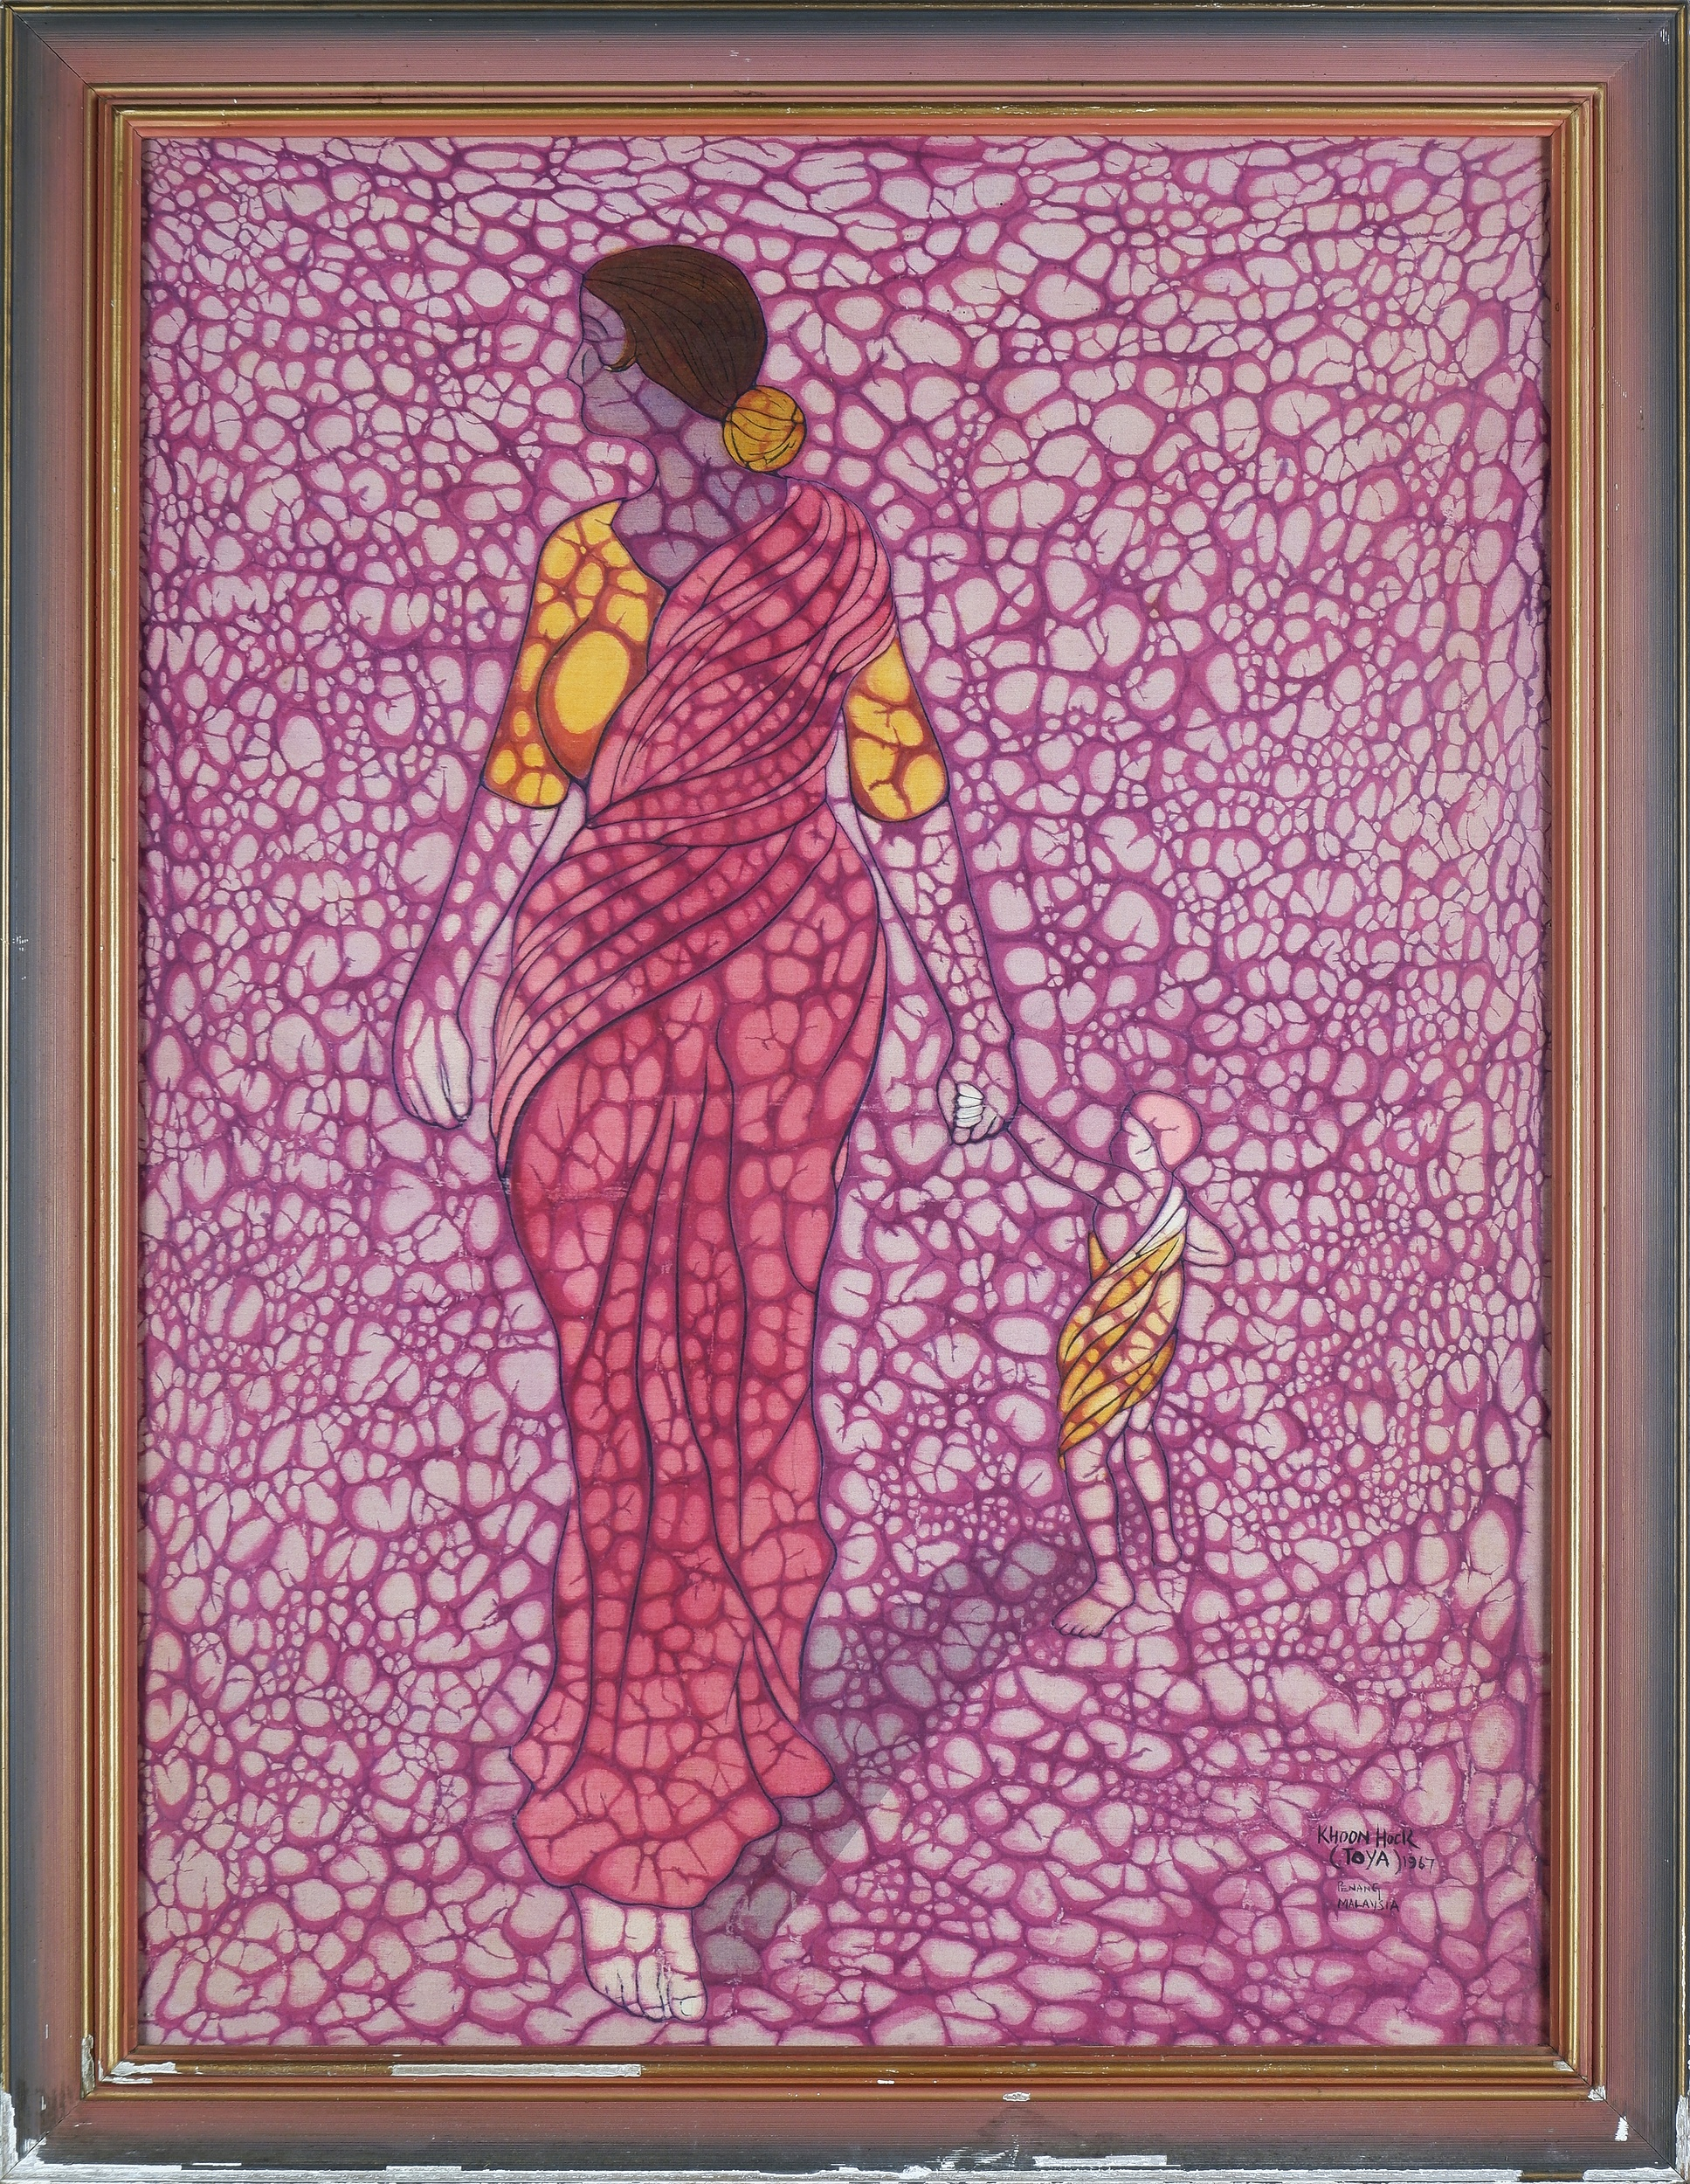 'Lim Khoon Hock (Toya) (born 1943, Malaysian), Untitled (Mother & Child), Batik'